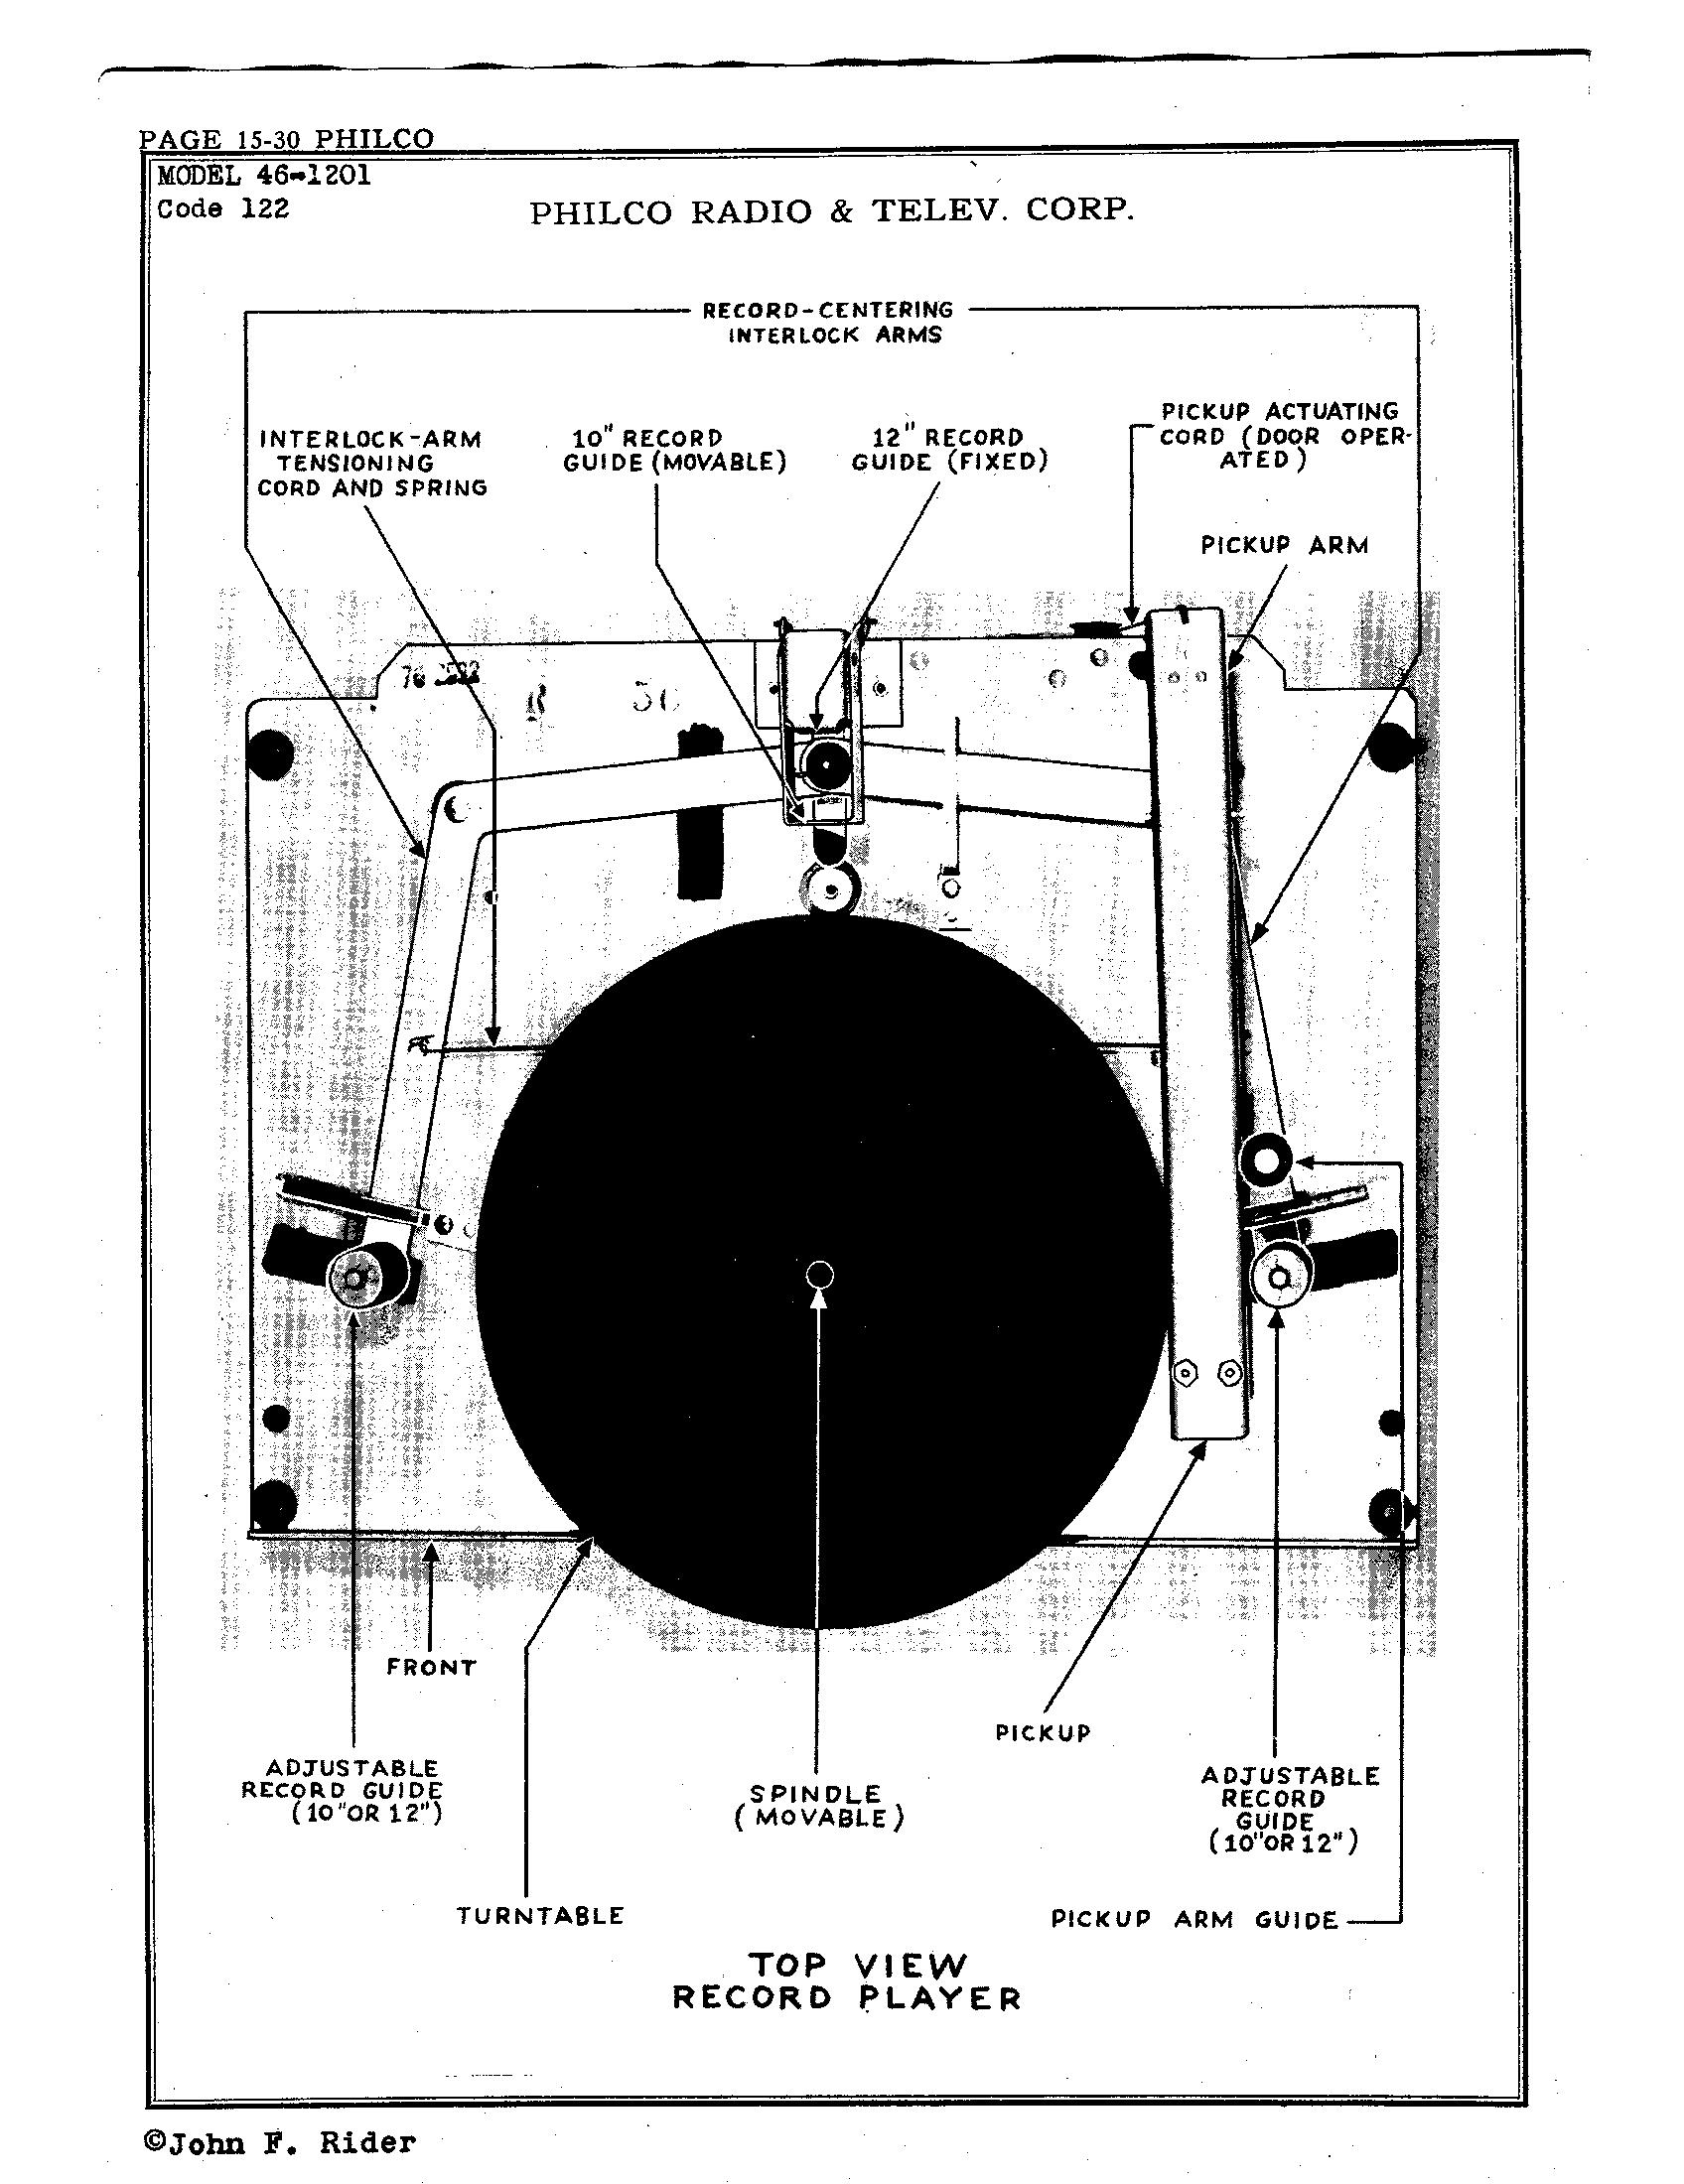 philco radio schematic model 46 1201 images